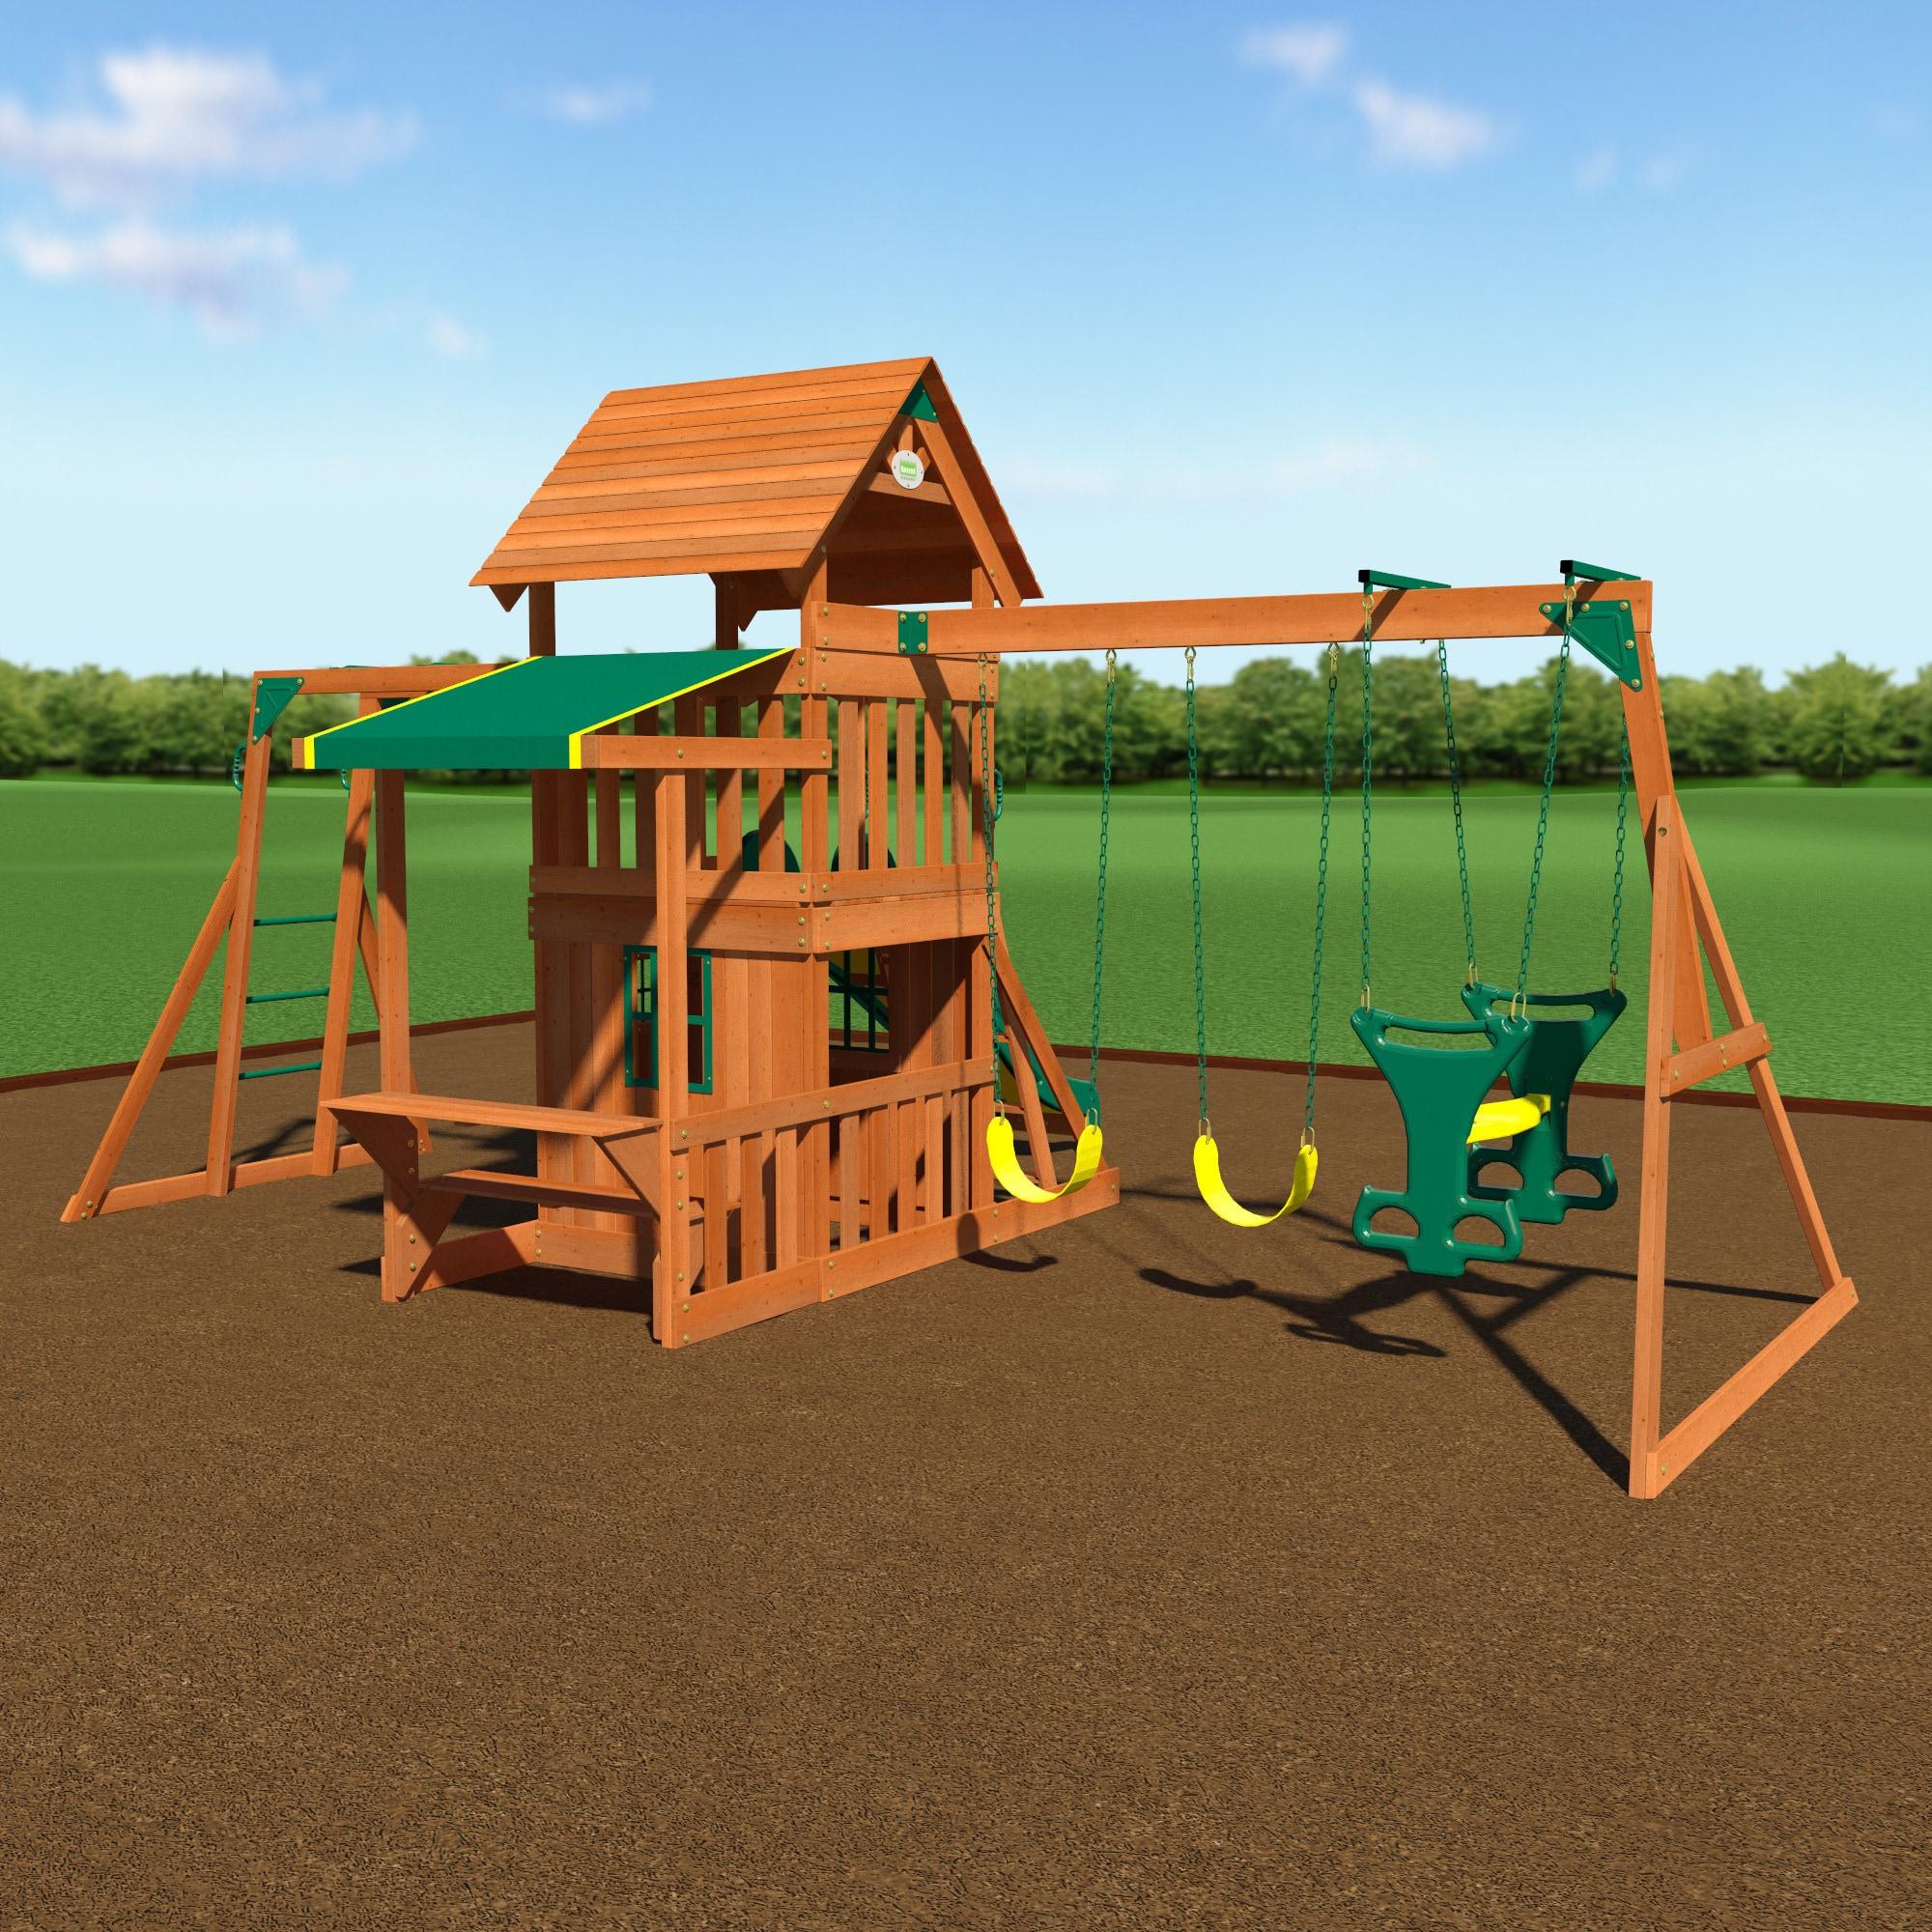 Backyard Discovery Monticello Cedar Swing Set shop backyard discovery saratoga all cedar swing set play set - free